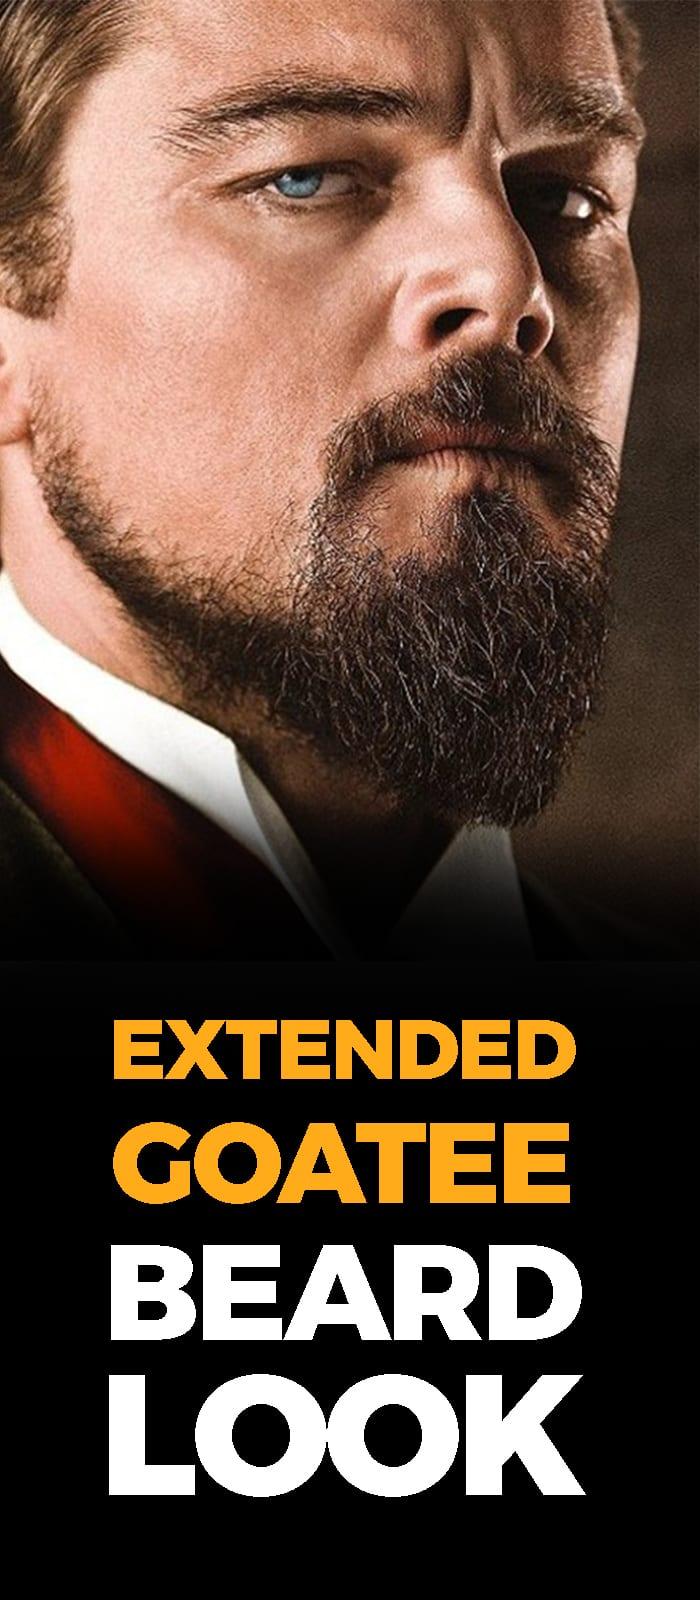 Extended Goatee Beard Looks